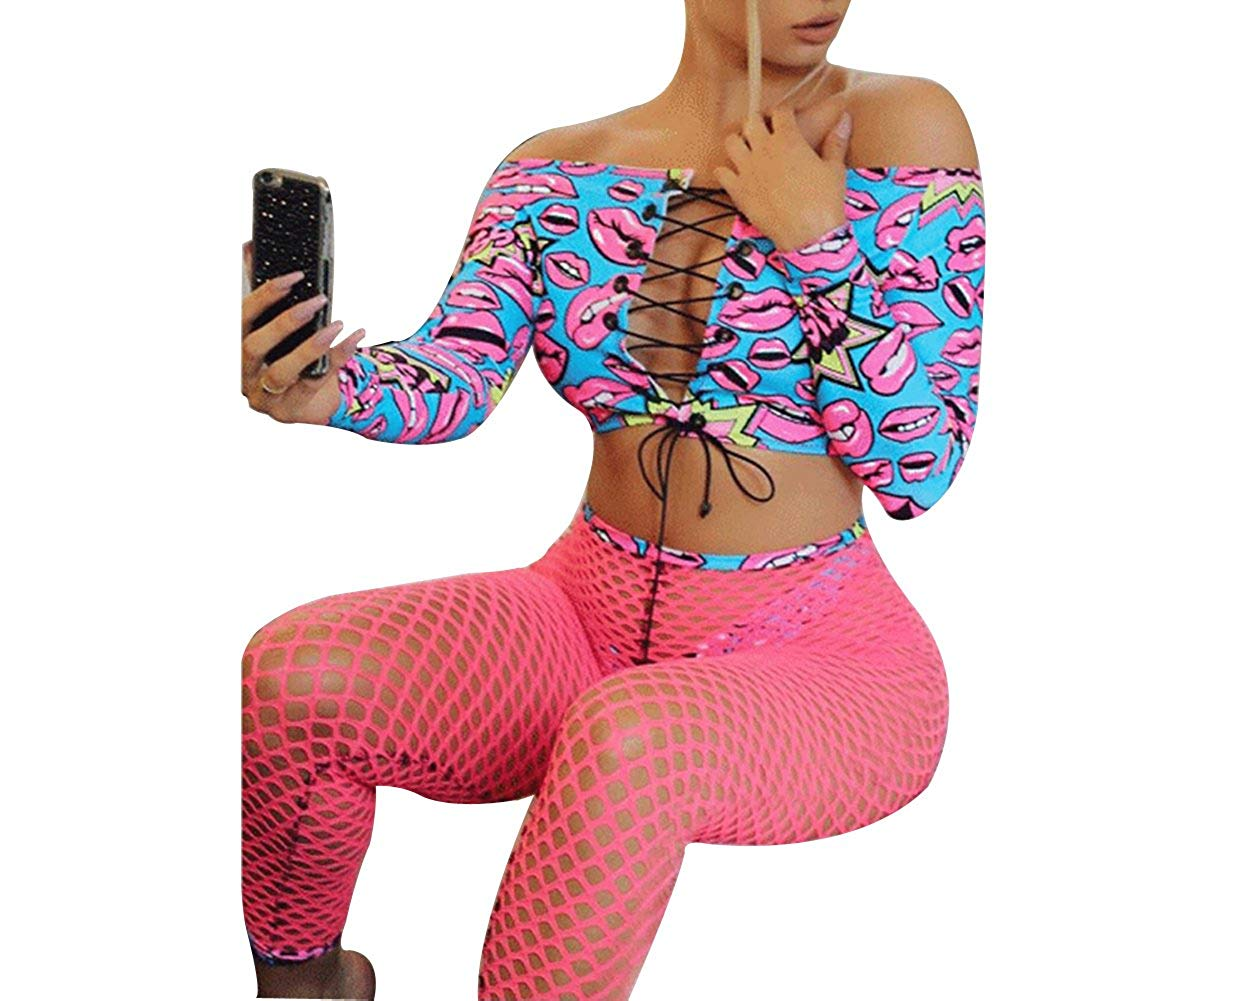 5c3e1a6237 Get Quotations · Women Sexy Lips Printed Off Shoulder Bikini Set + Fishnet  Pants 3Pcs Swimsuit Beachwear Fishnet Tights